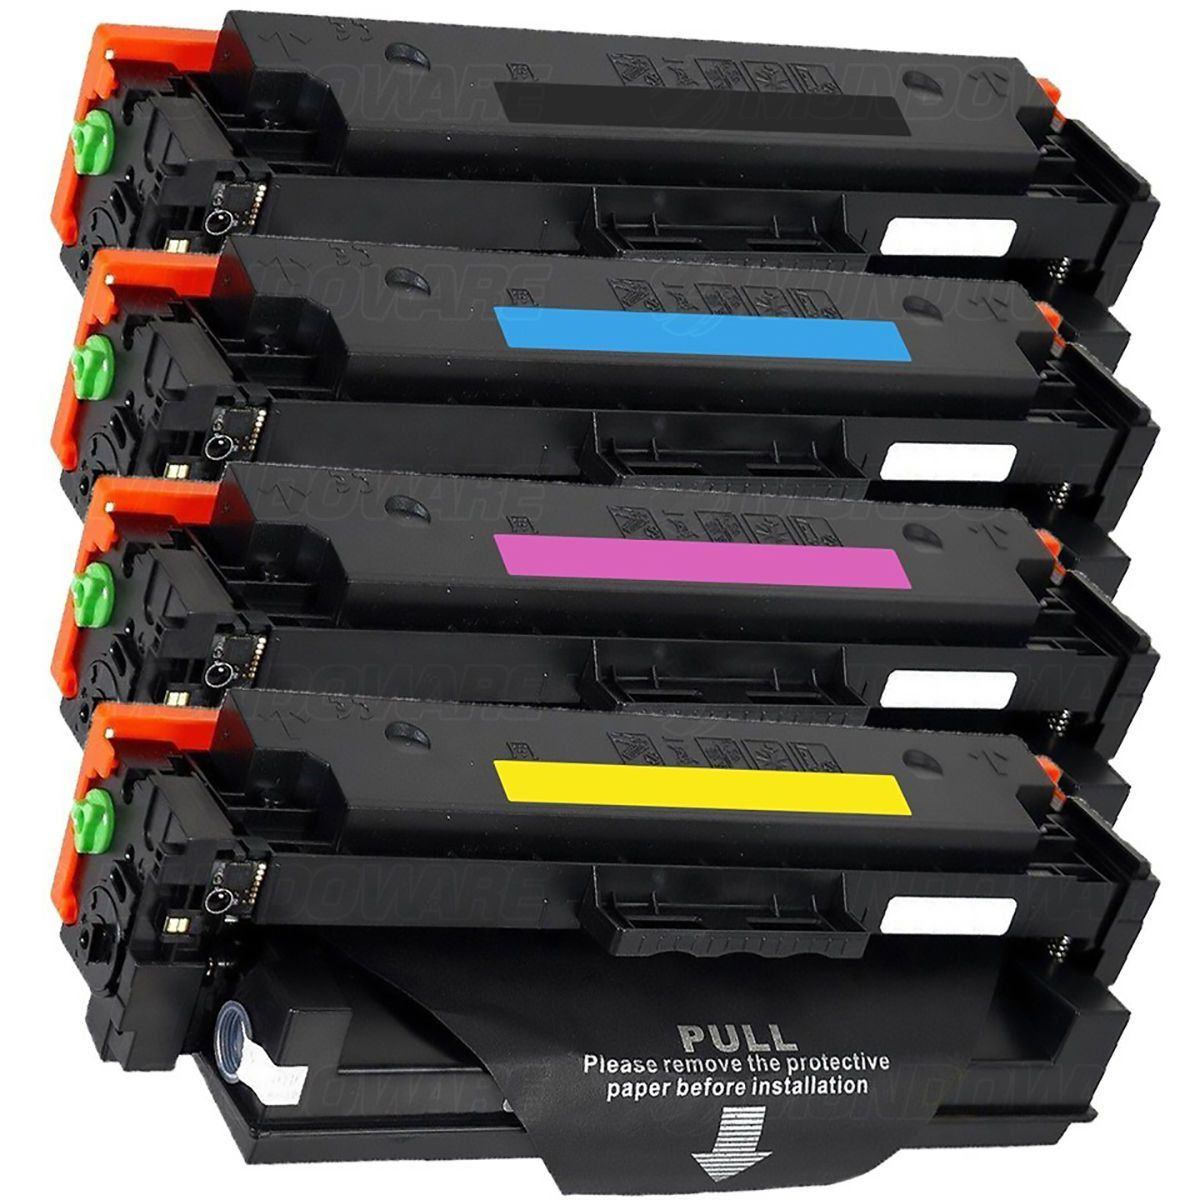 Compatível: Kit Colorido de Toner CF410X para HP M452 M477 M477fdw M452dn M477fnw M452nw M477fdn M452dw 477fdw 477fnw